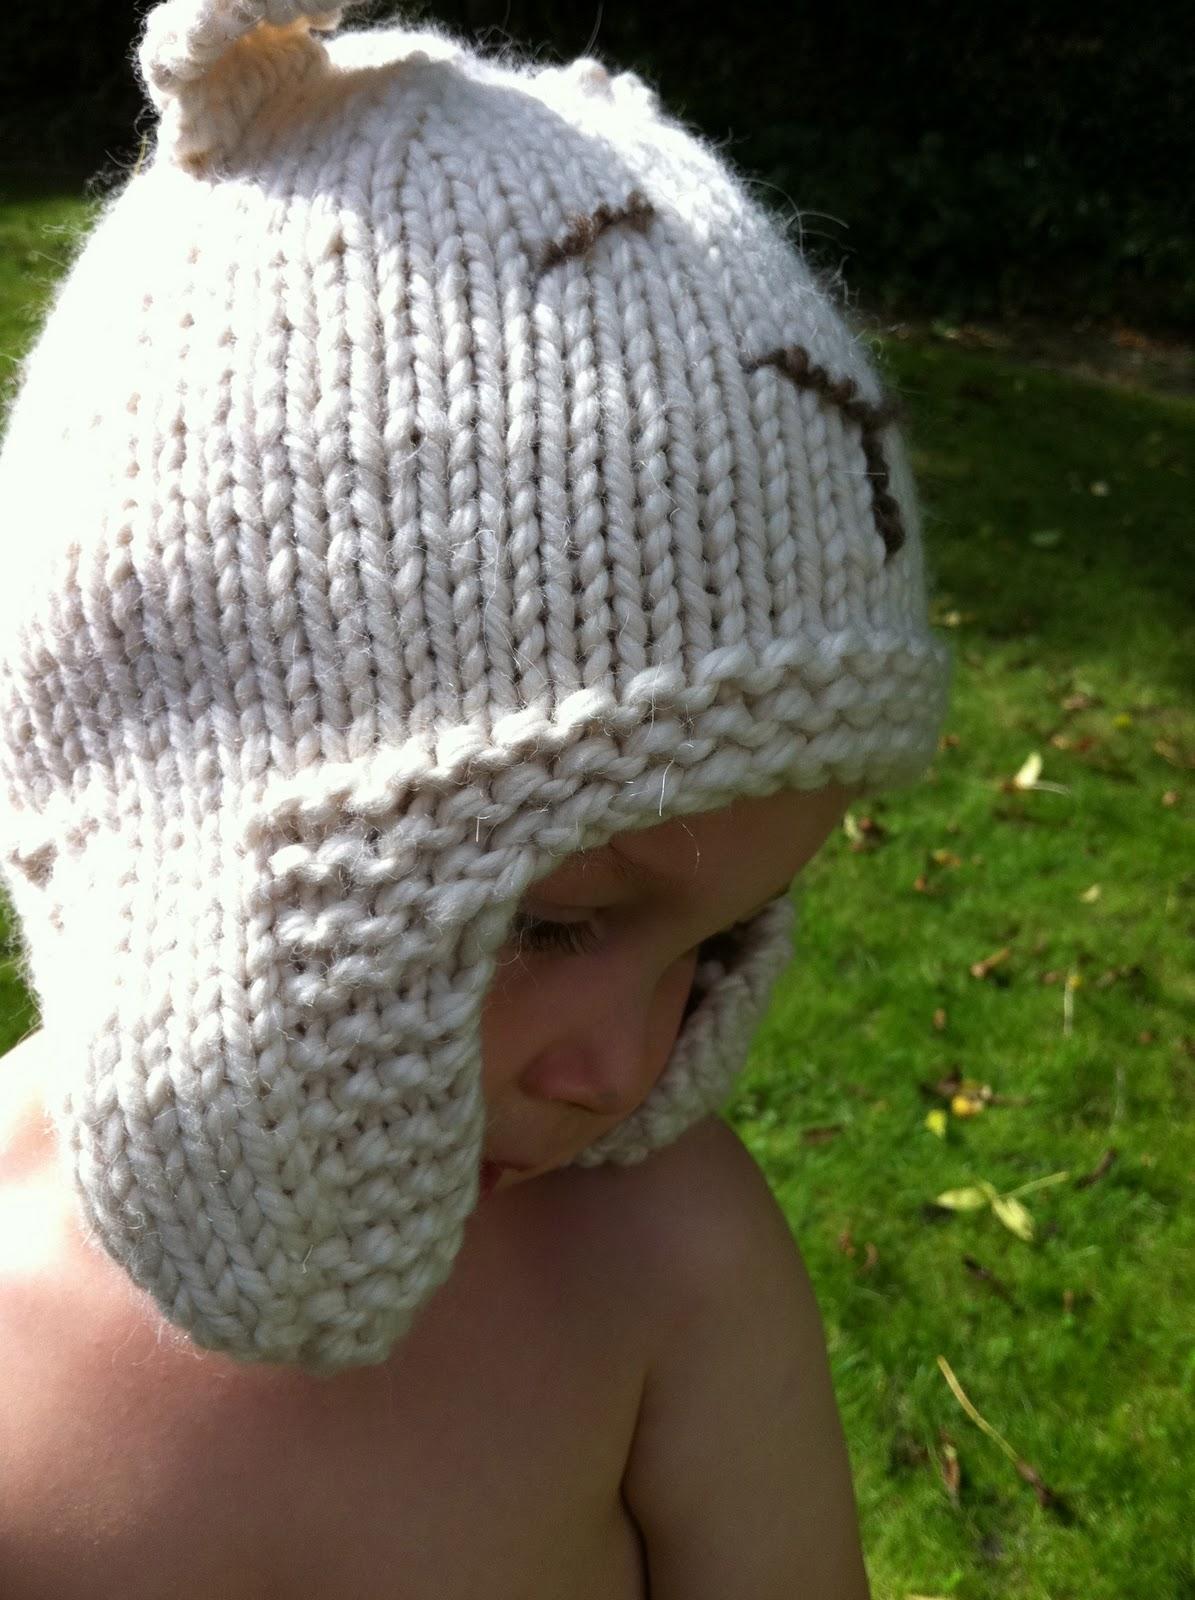 cef4451ae68 Stitch me Softly...  Sleepy Polar Bear Hat - knitting pattern